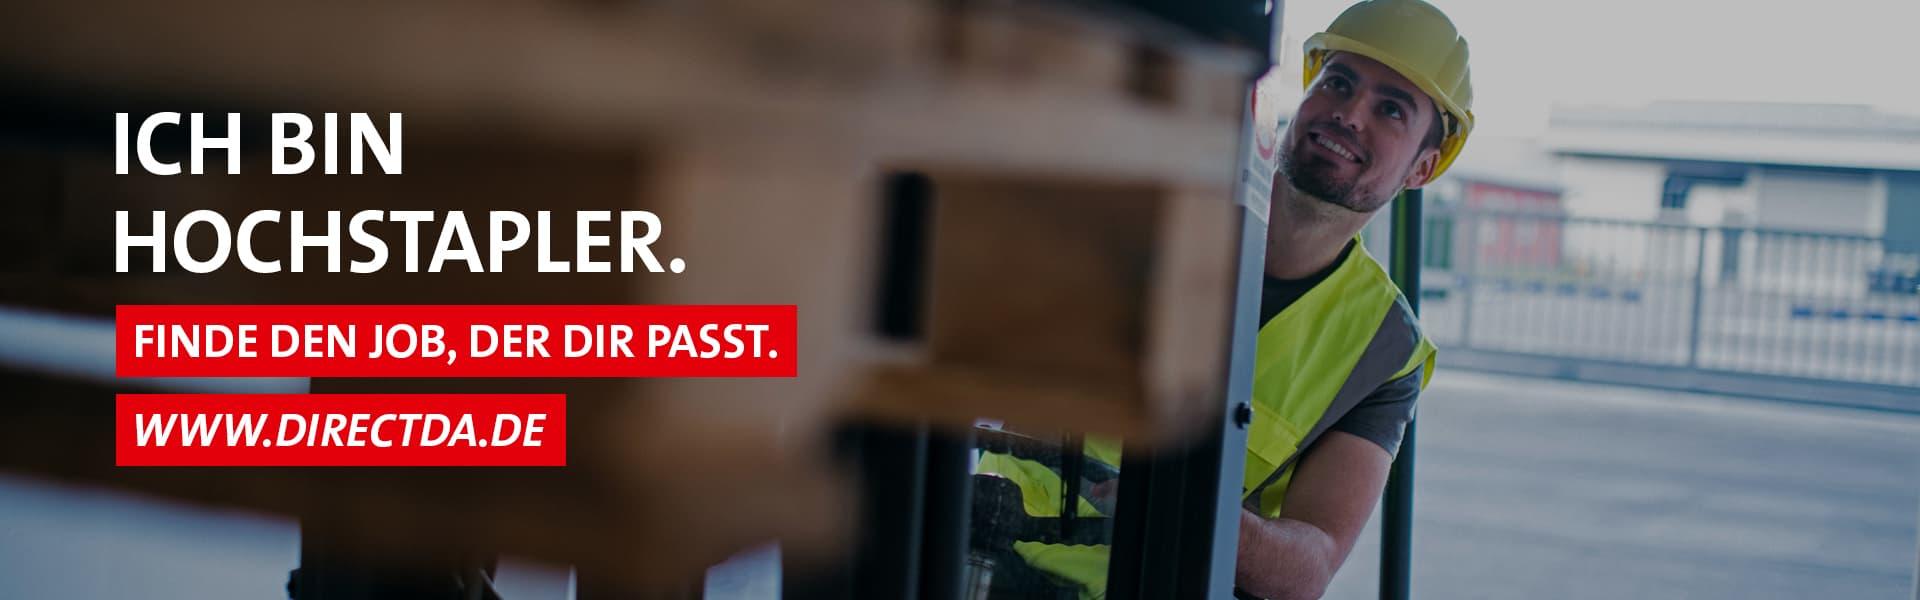 Stellenangebot Staplerfahrer – Finde den Job, der dir passt. www.directda.de